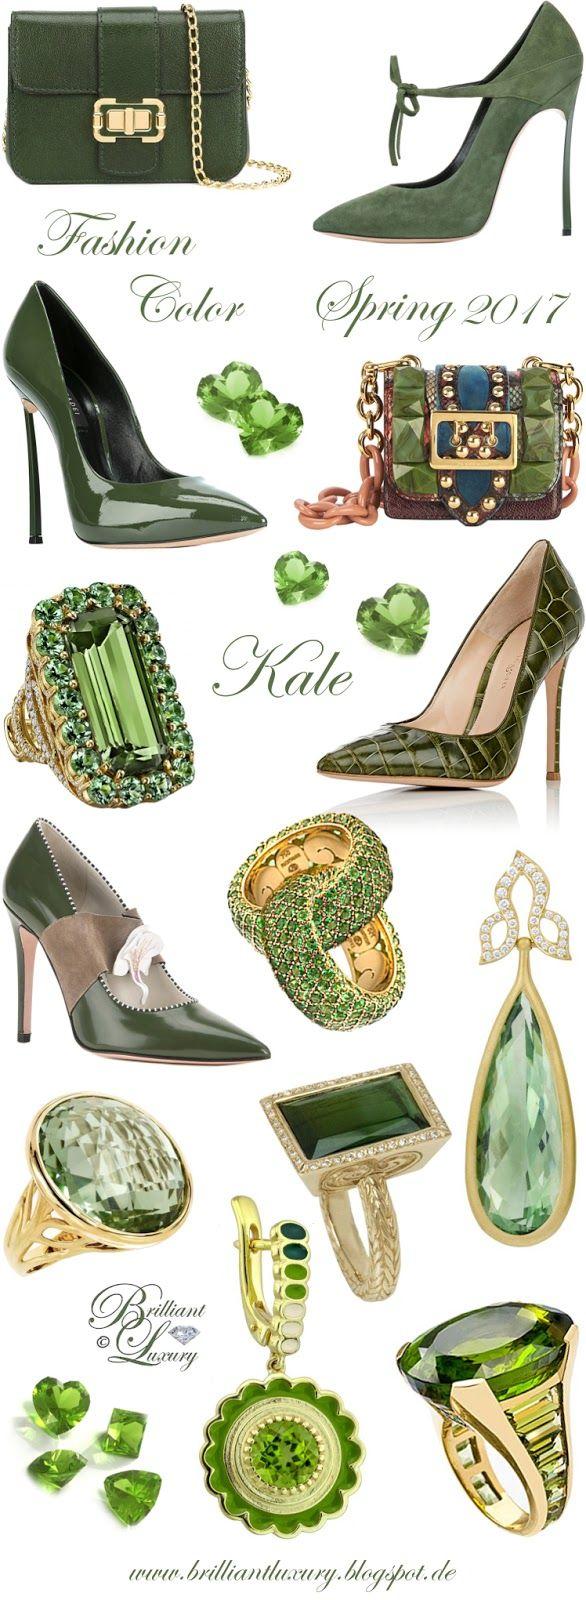 Brilliant Luxury by Emmy DE ♦ Fashion Color Spring 2017 ~ kale